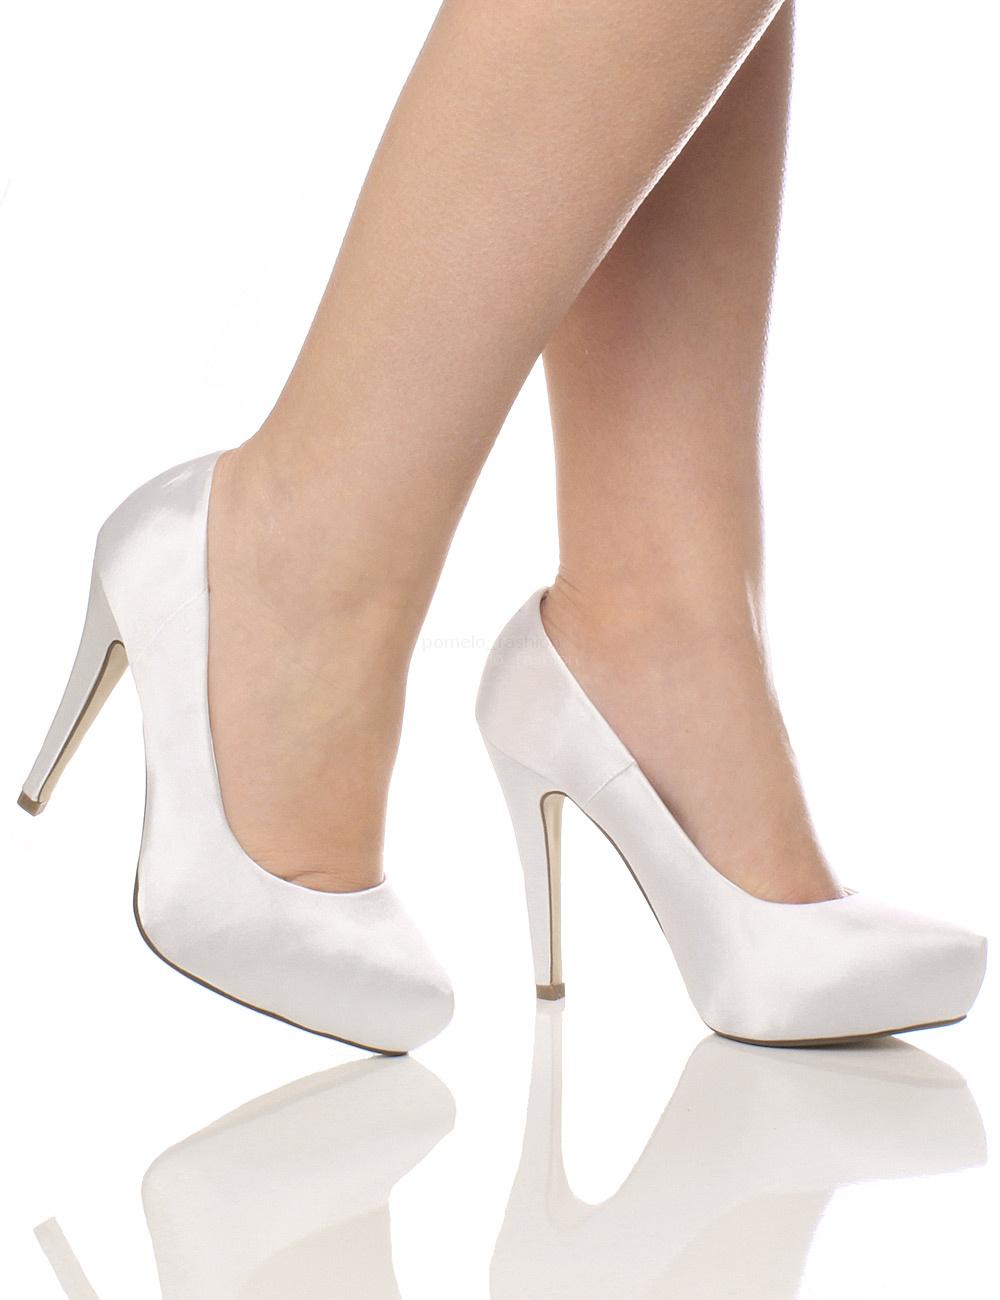 womens ladies bridal wedding prom party high heel platform pumps shoes size ebay. Black Bedroom Furniture Sets. Home Design Ideas